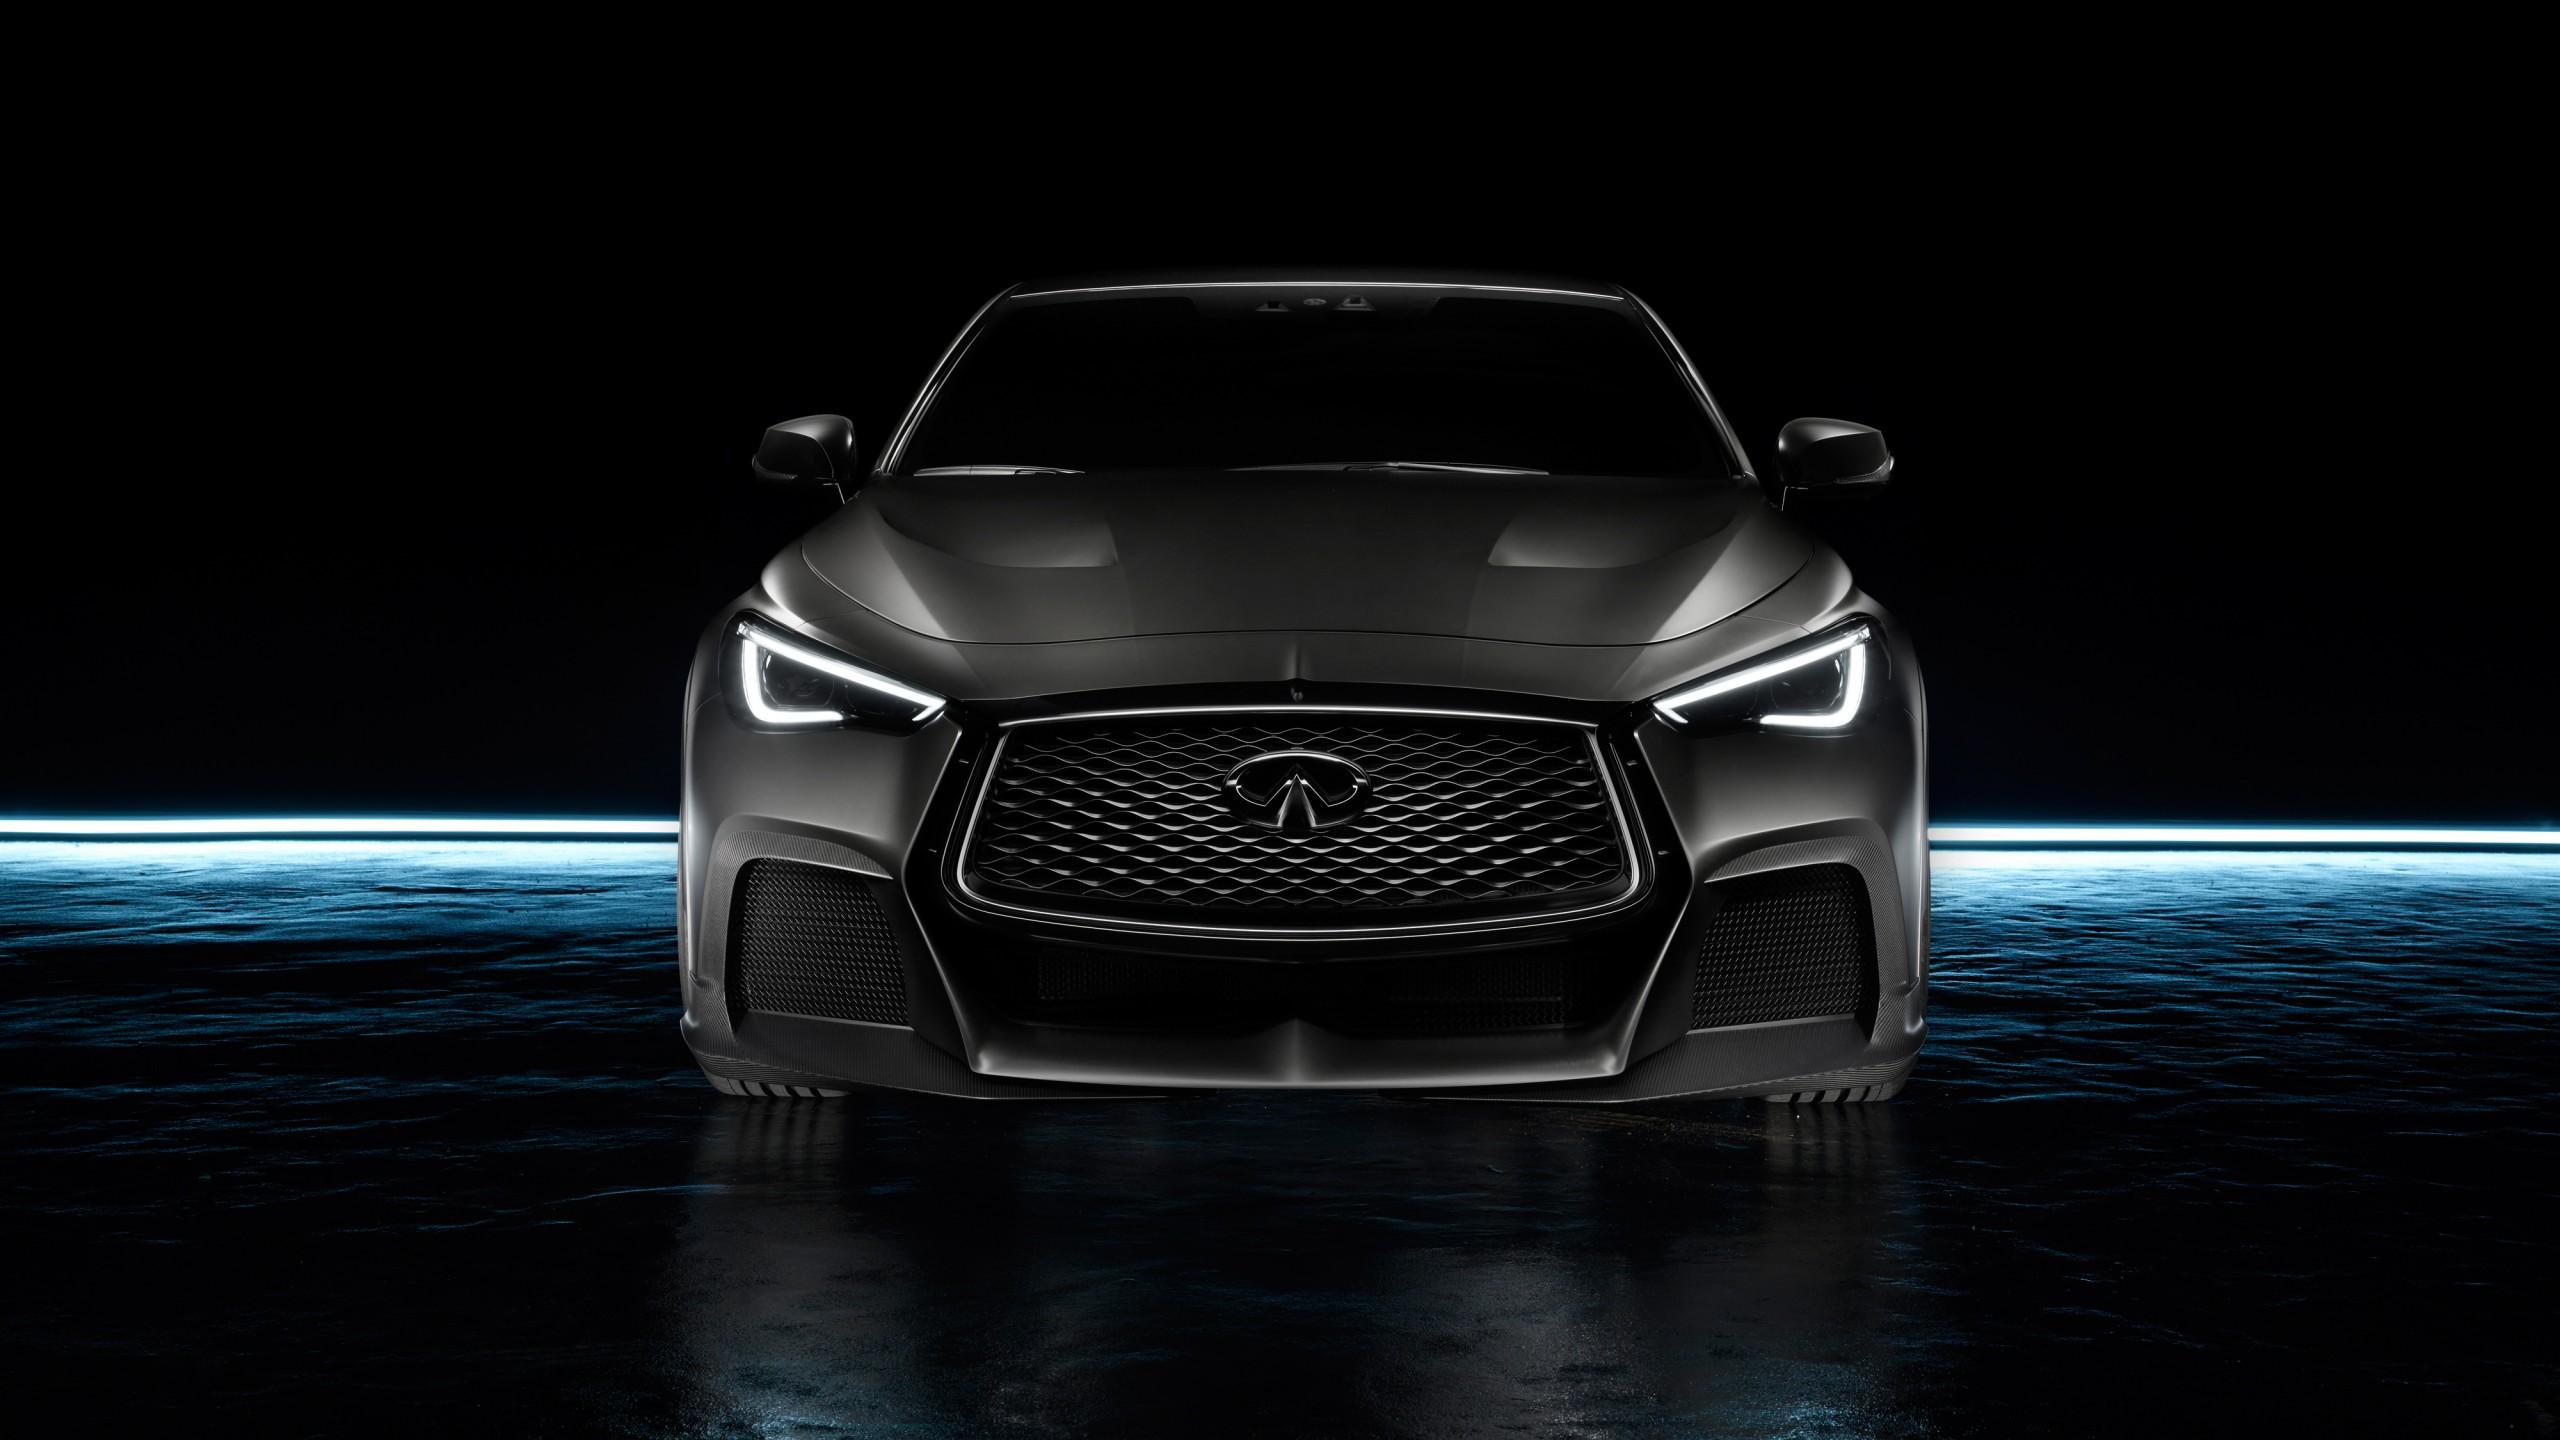 2017 Infiniti Q60 Convertible >> 2017 Infiniti Q60 Project Black S Wallpaper | HD Car Wallpapers | ID #7512